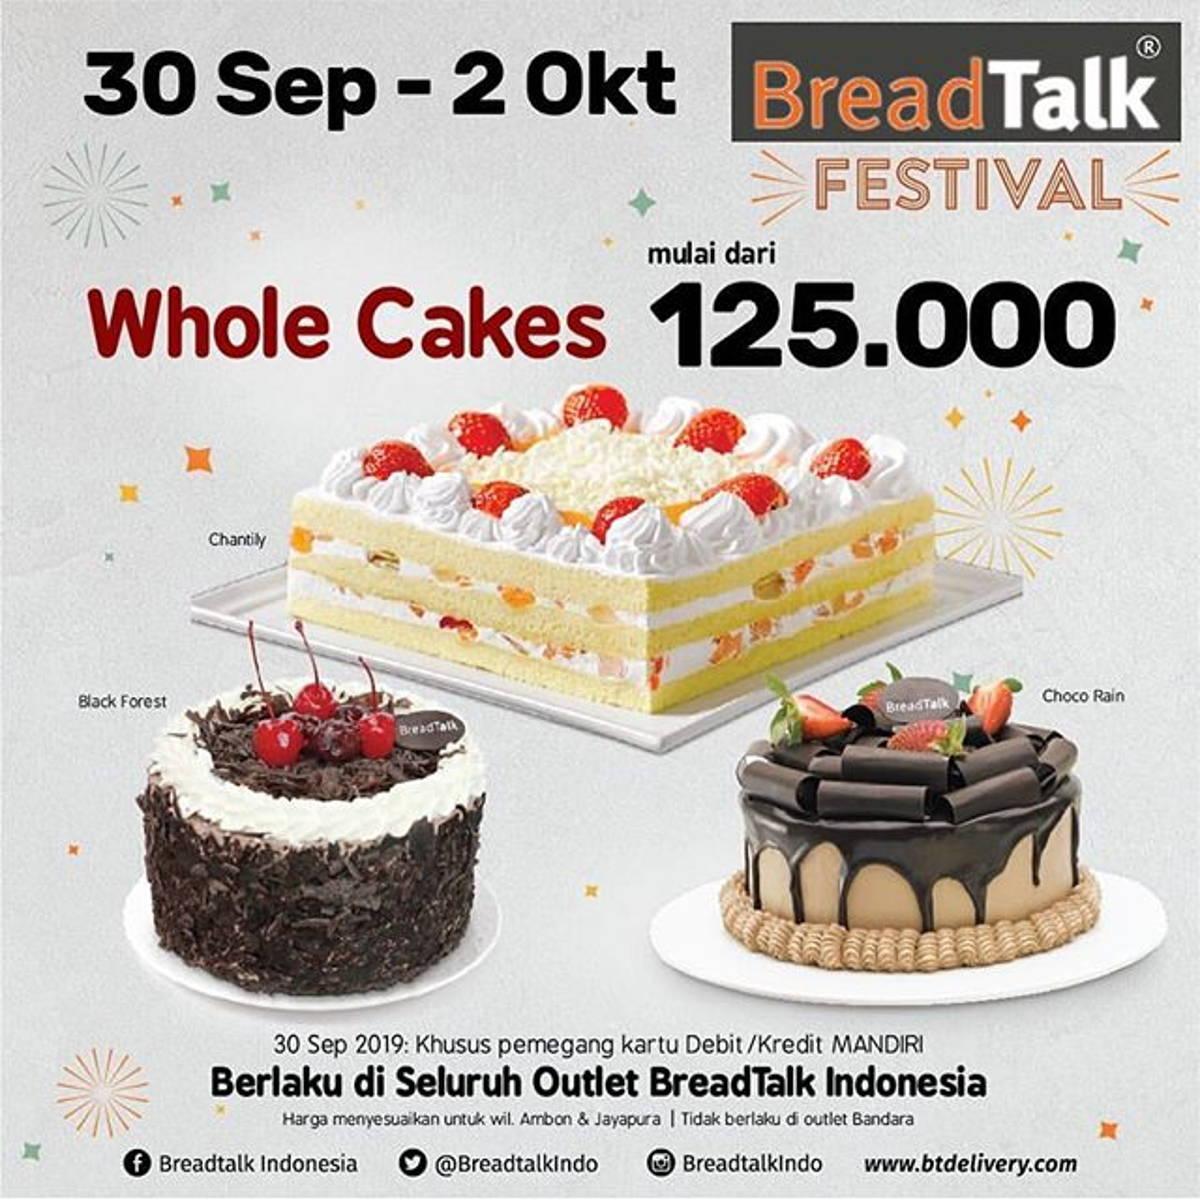 Katalog Promo: BreadTalk: Promo BREADTALK FESTIVAL Semua Roti 7.500*, Whole Cakes mulai dr 125.000* - 1